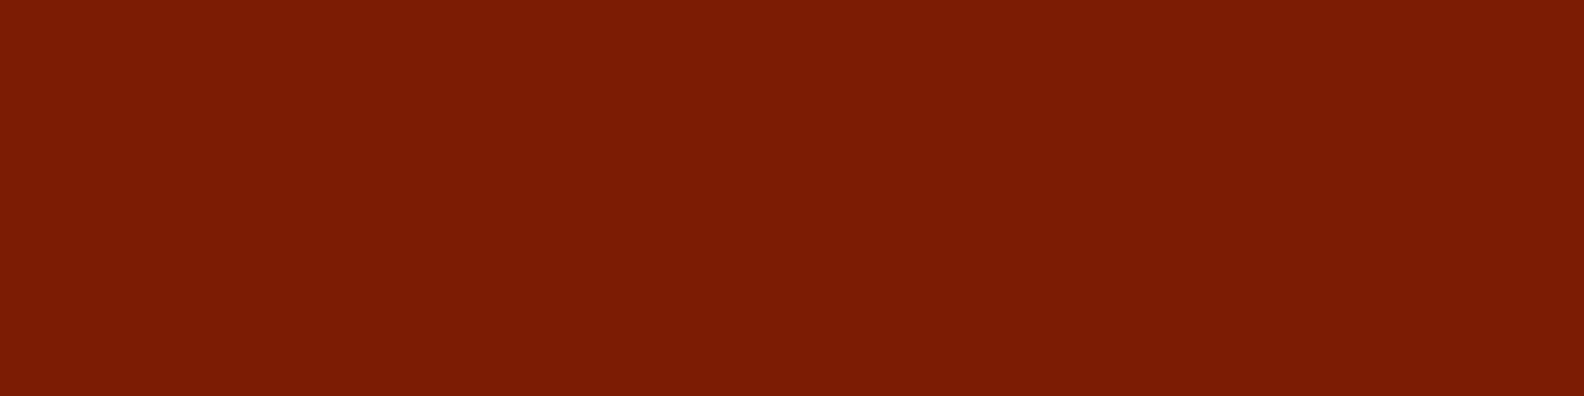 1584x396 Kenyan Copper Solid Color Background